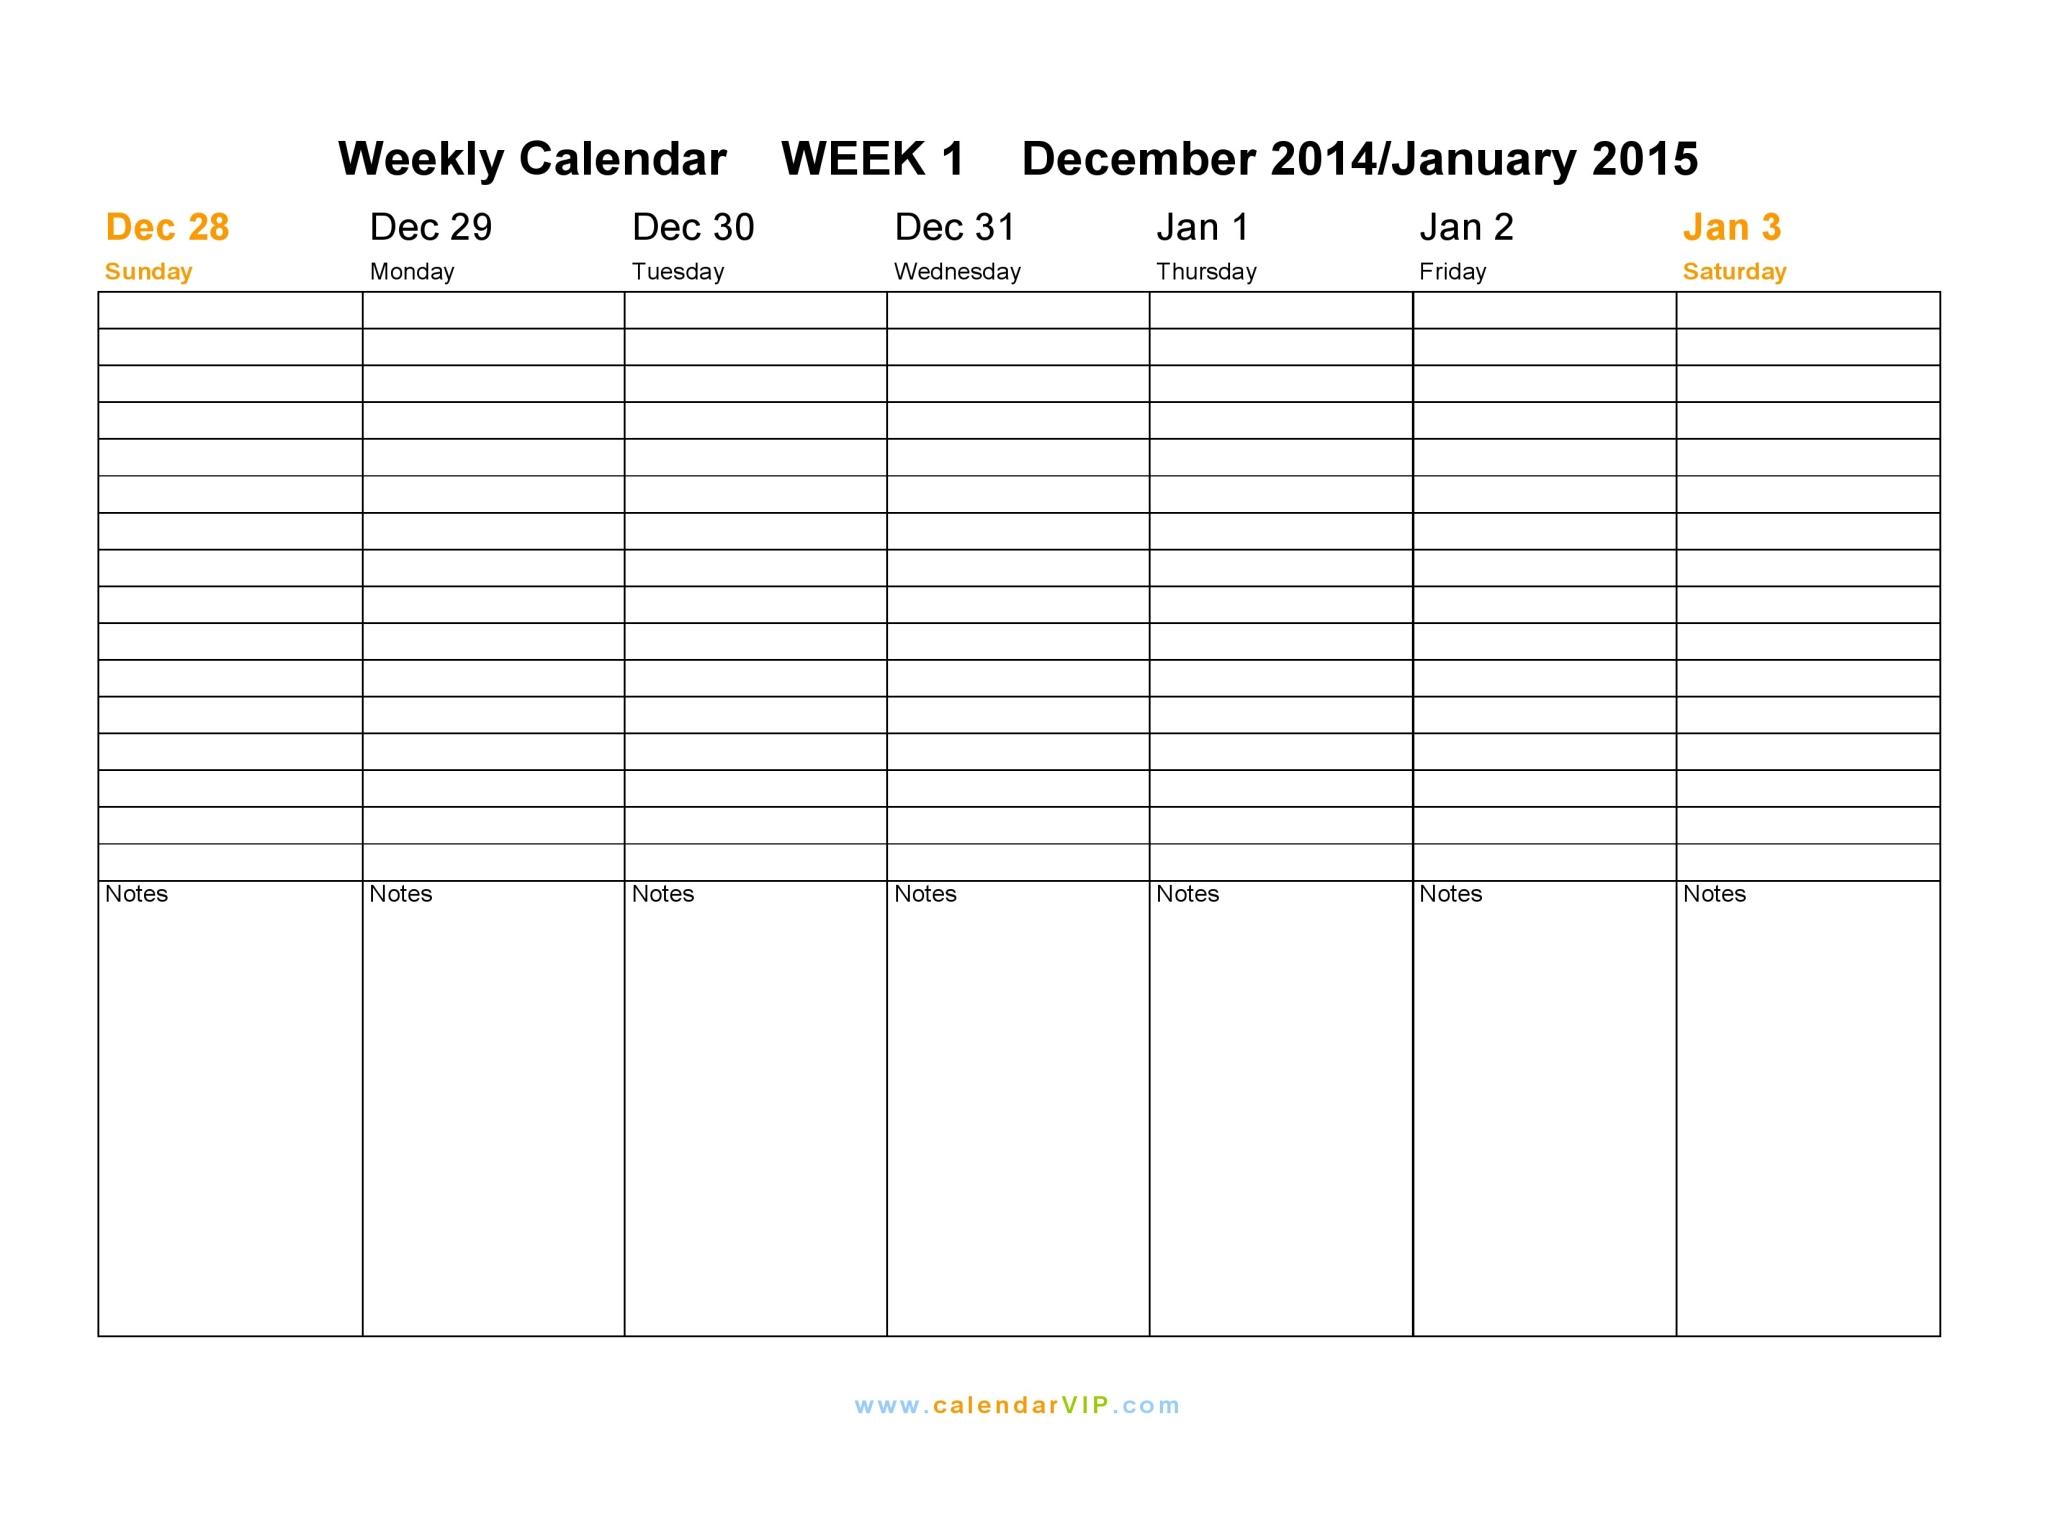 Weekly Calendar 2015 Free Weekly Calendar Templates 1